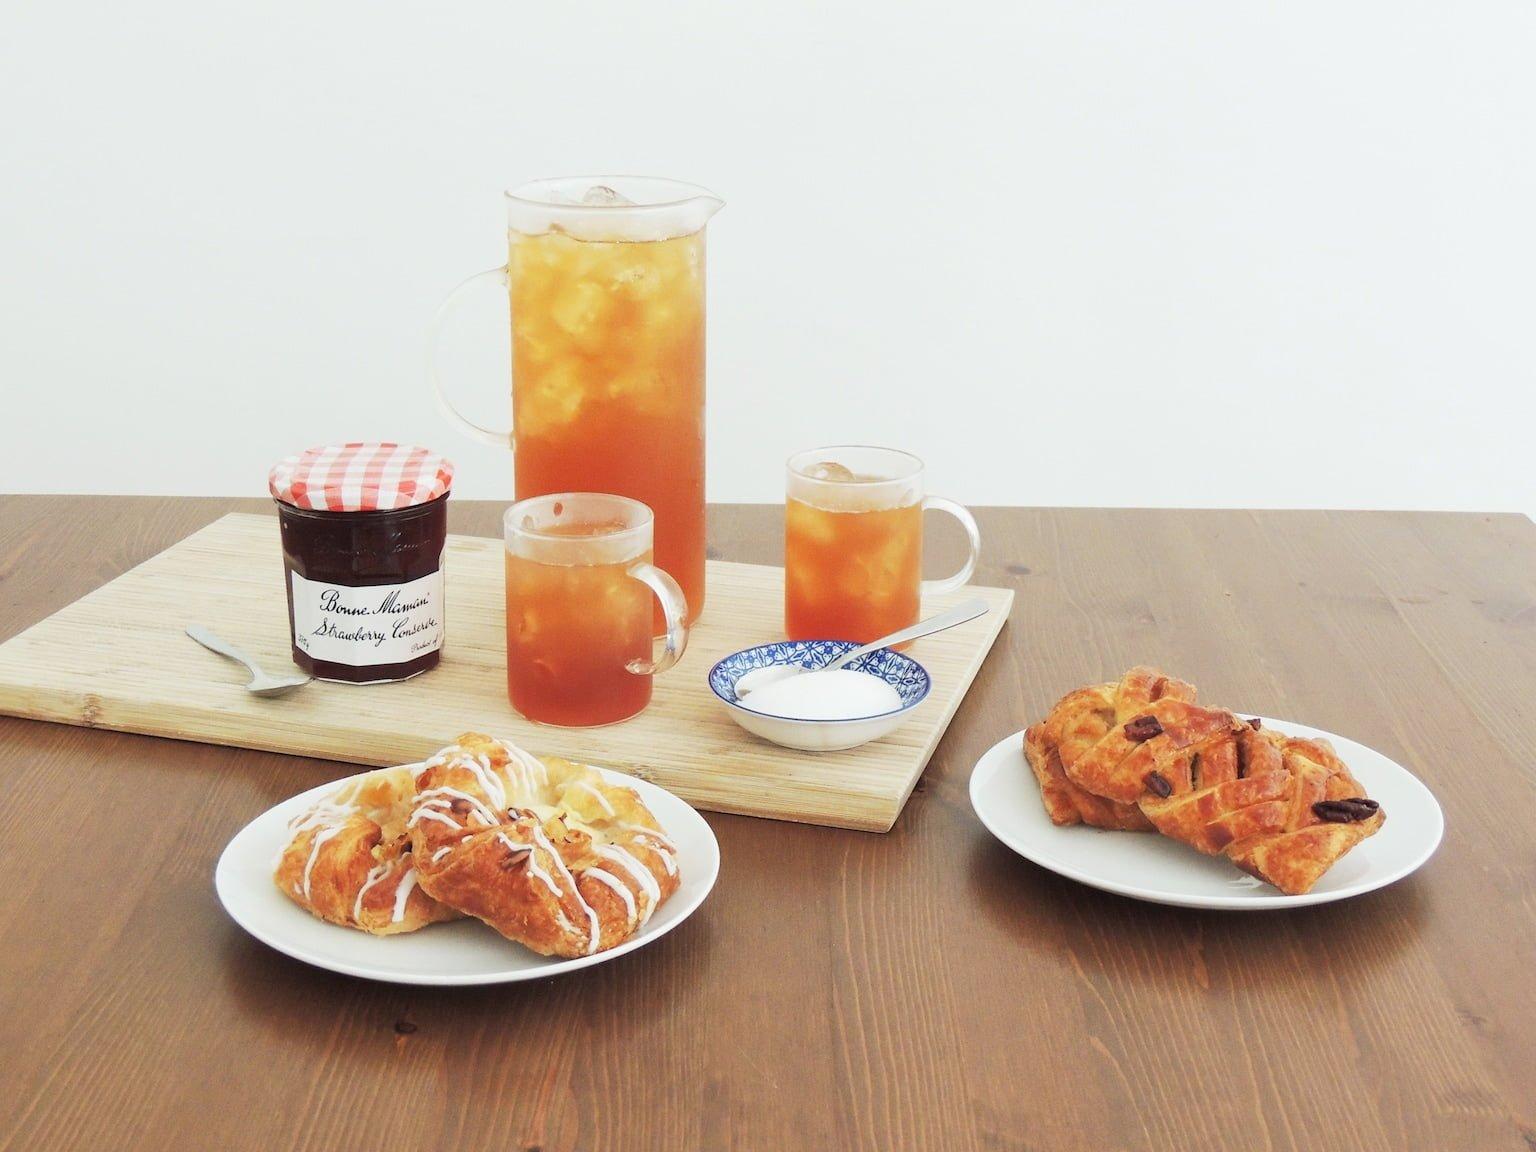 Iced Tea with Pastries | Adagio Teas